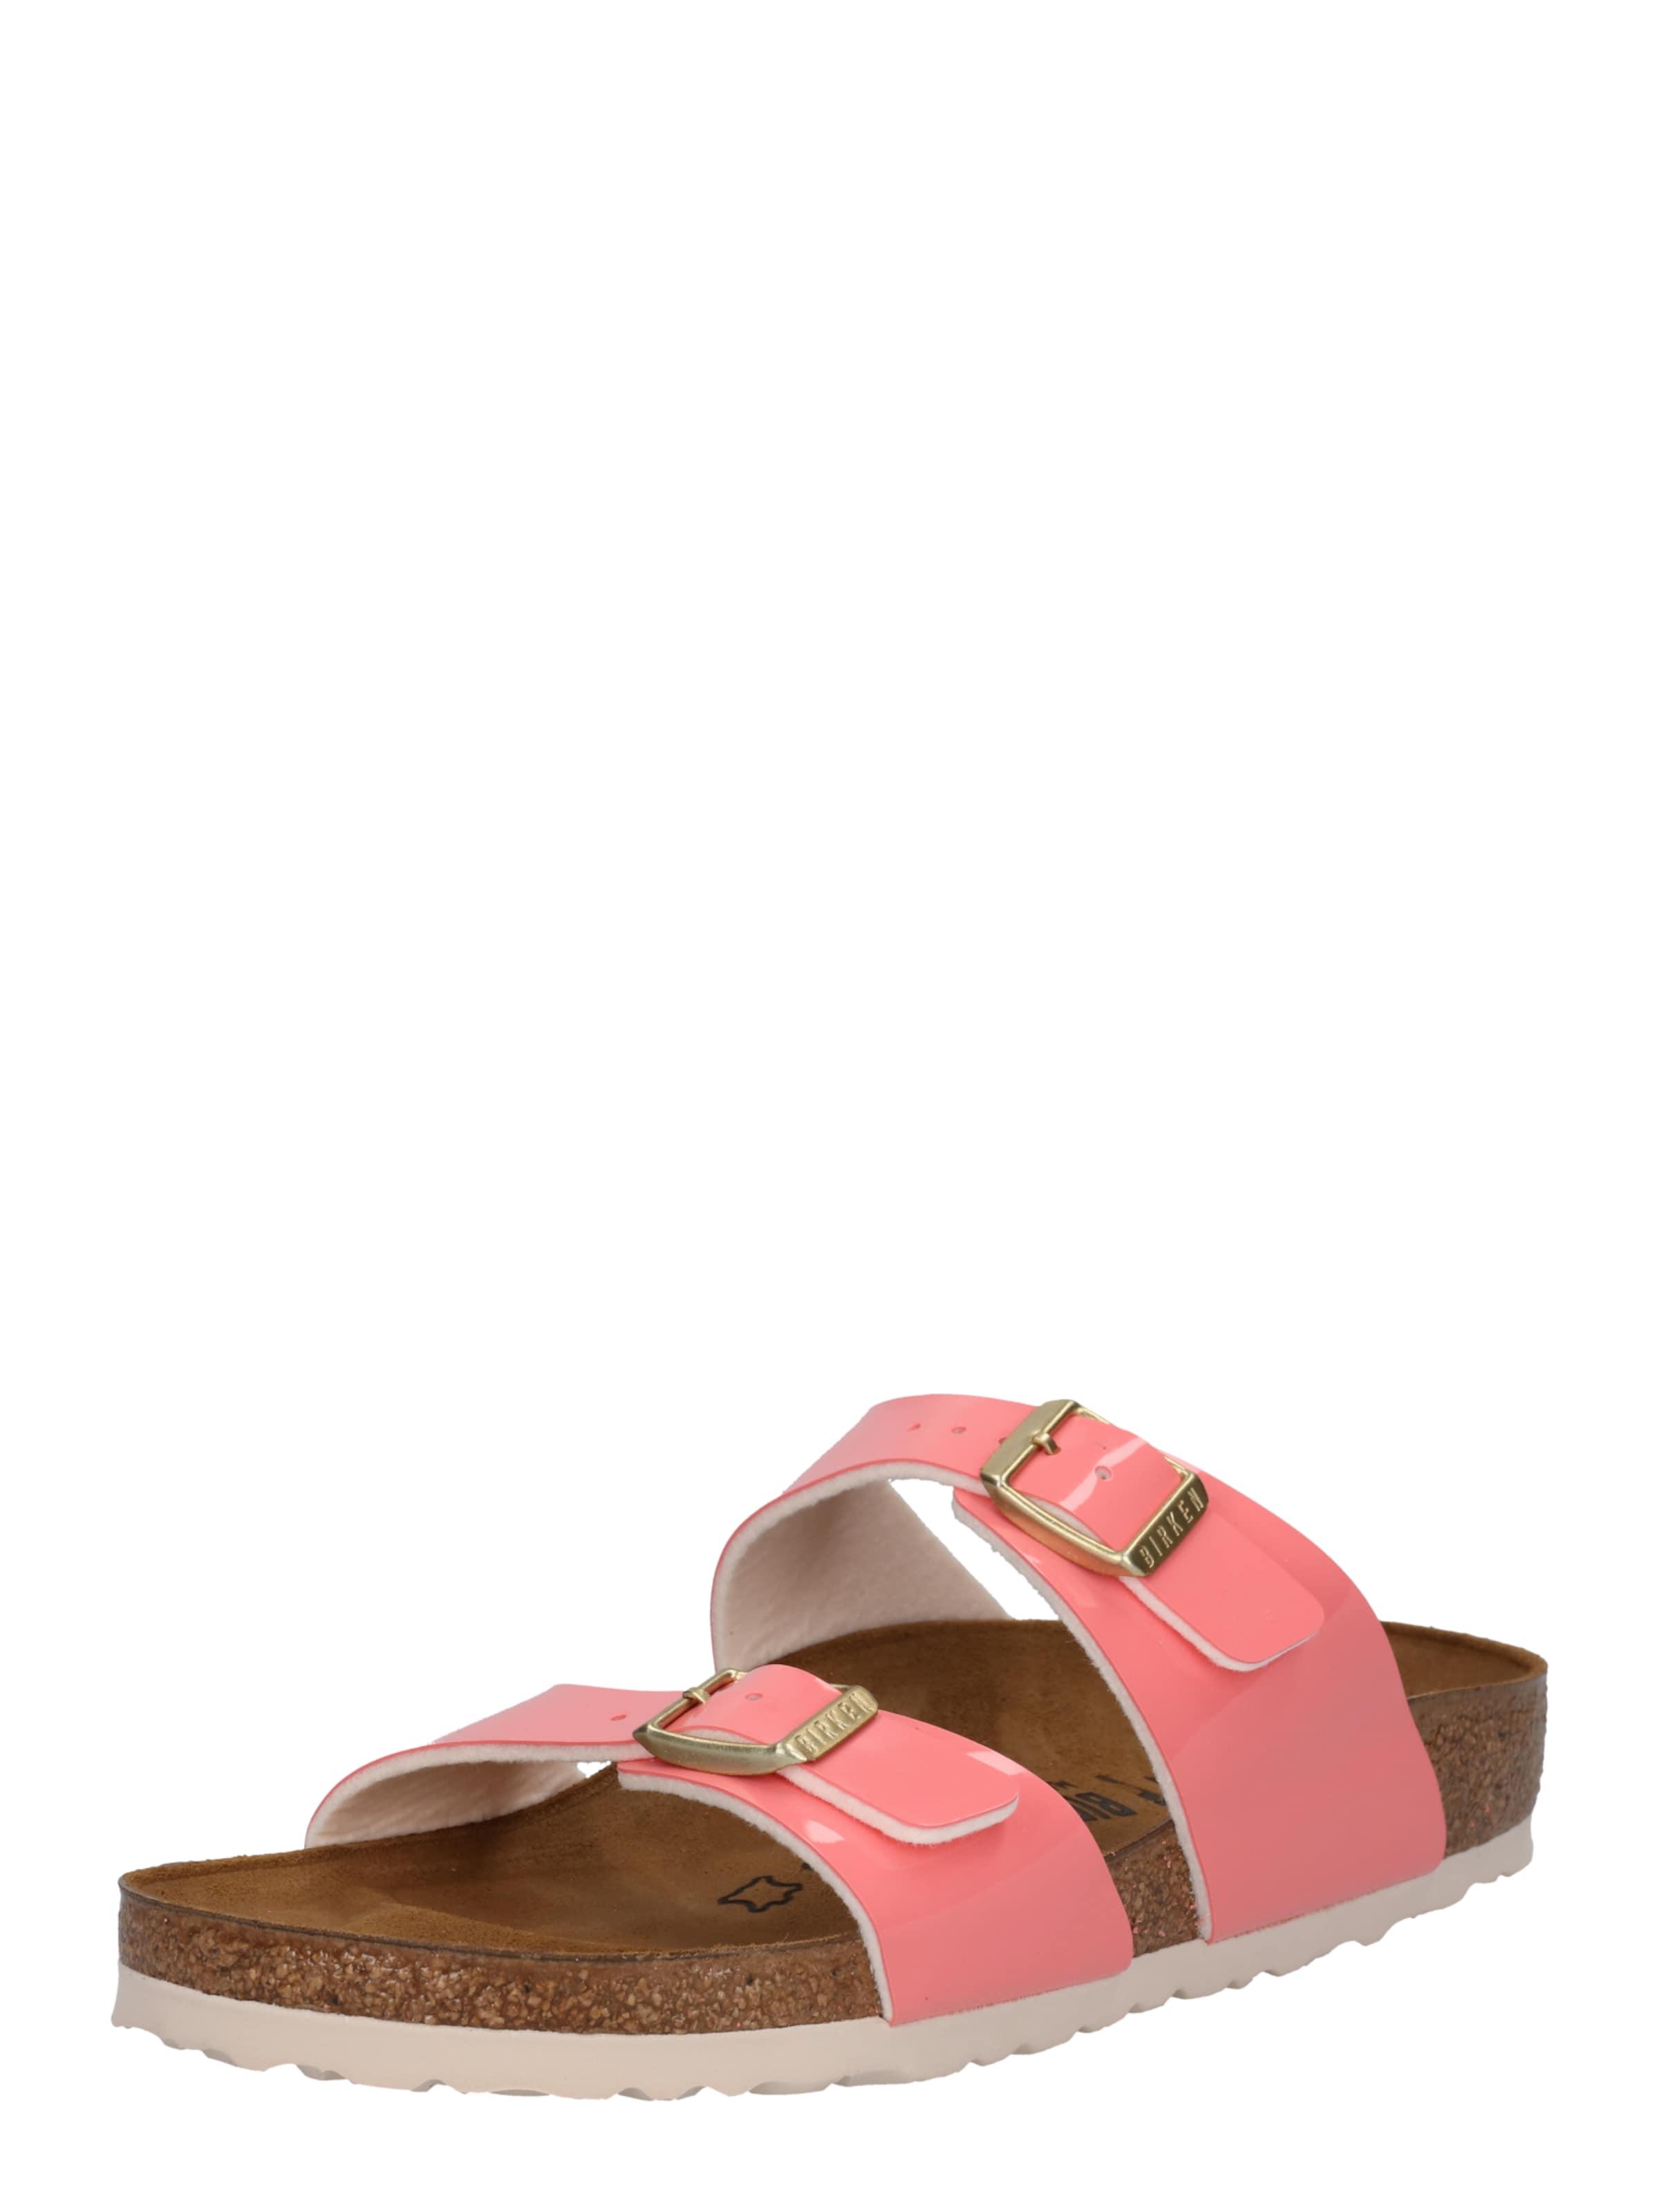 BIRKENSTOCK Sandale Sydney Verschleißfeste billige Schuhe